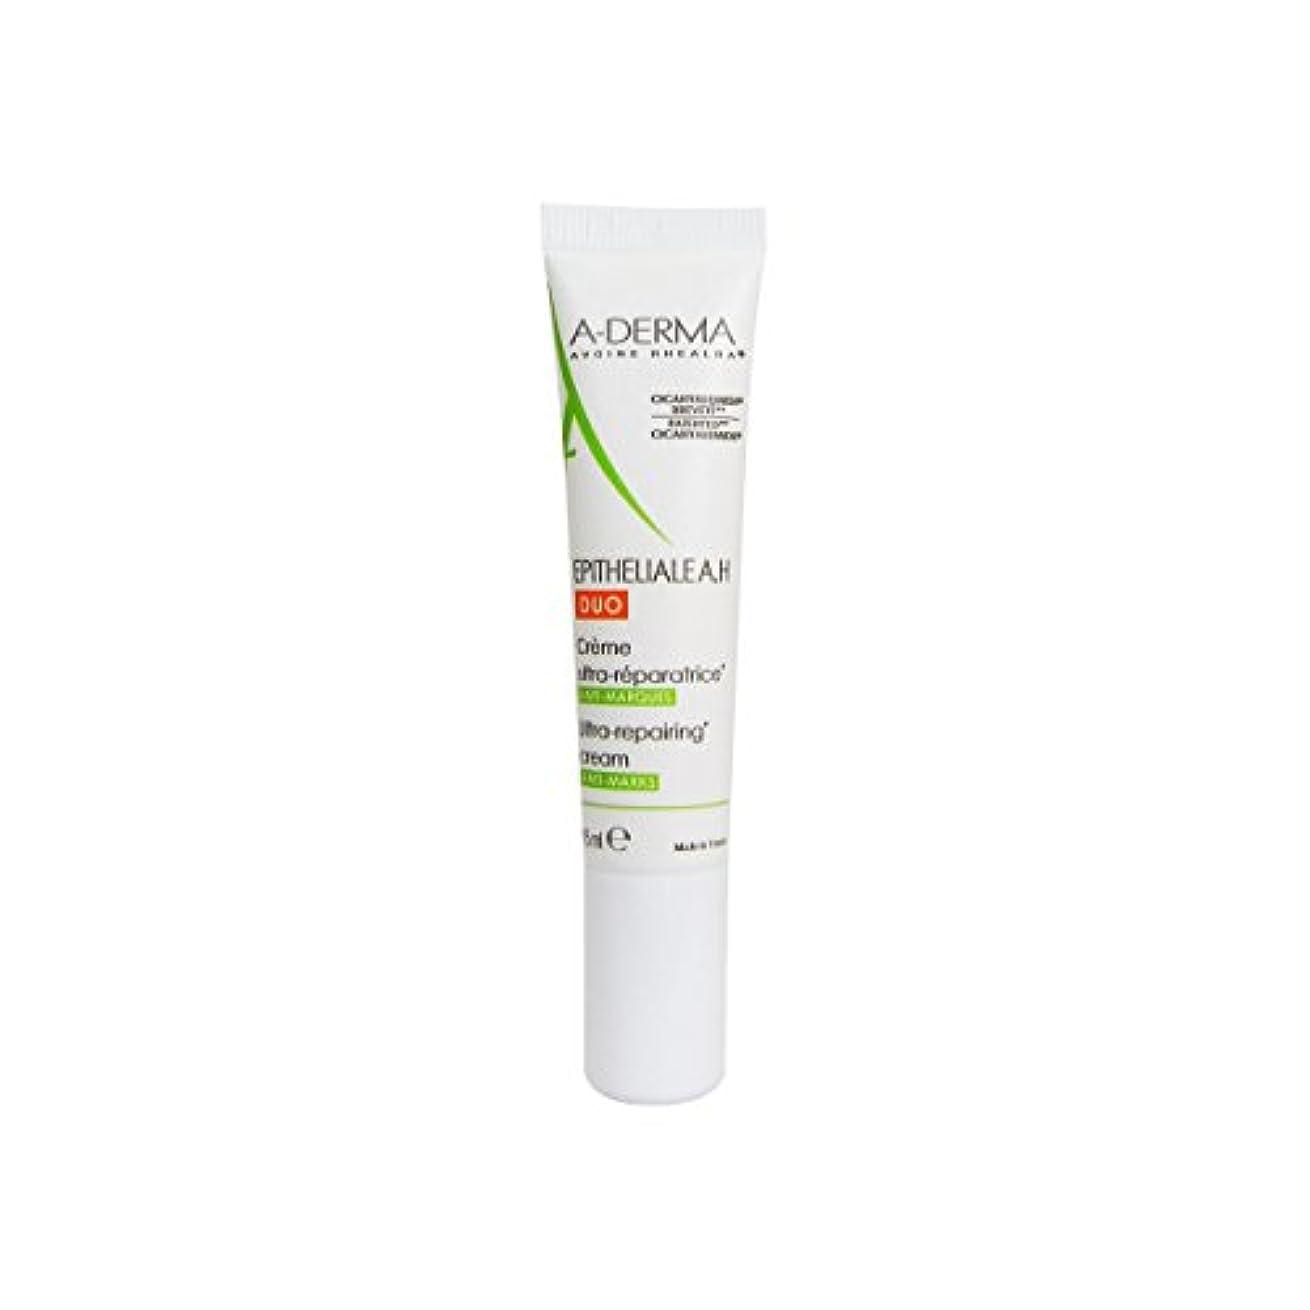 南西松の木充電A-derma Epitheliale Ah Duo Repair Cream 15ml [並行輸入品]